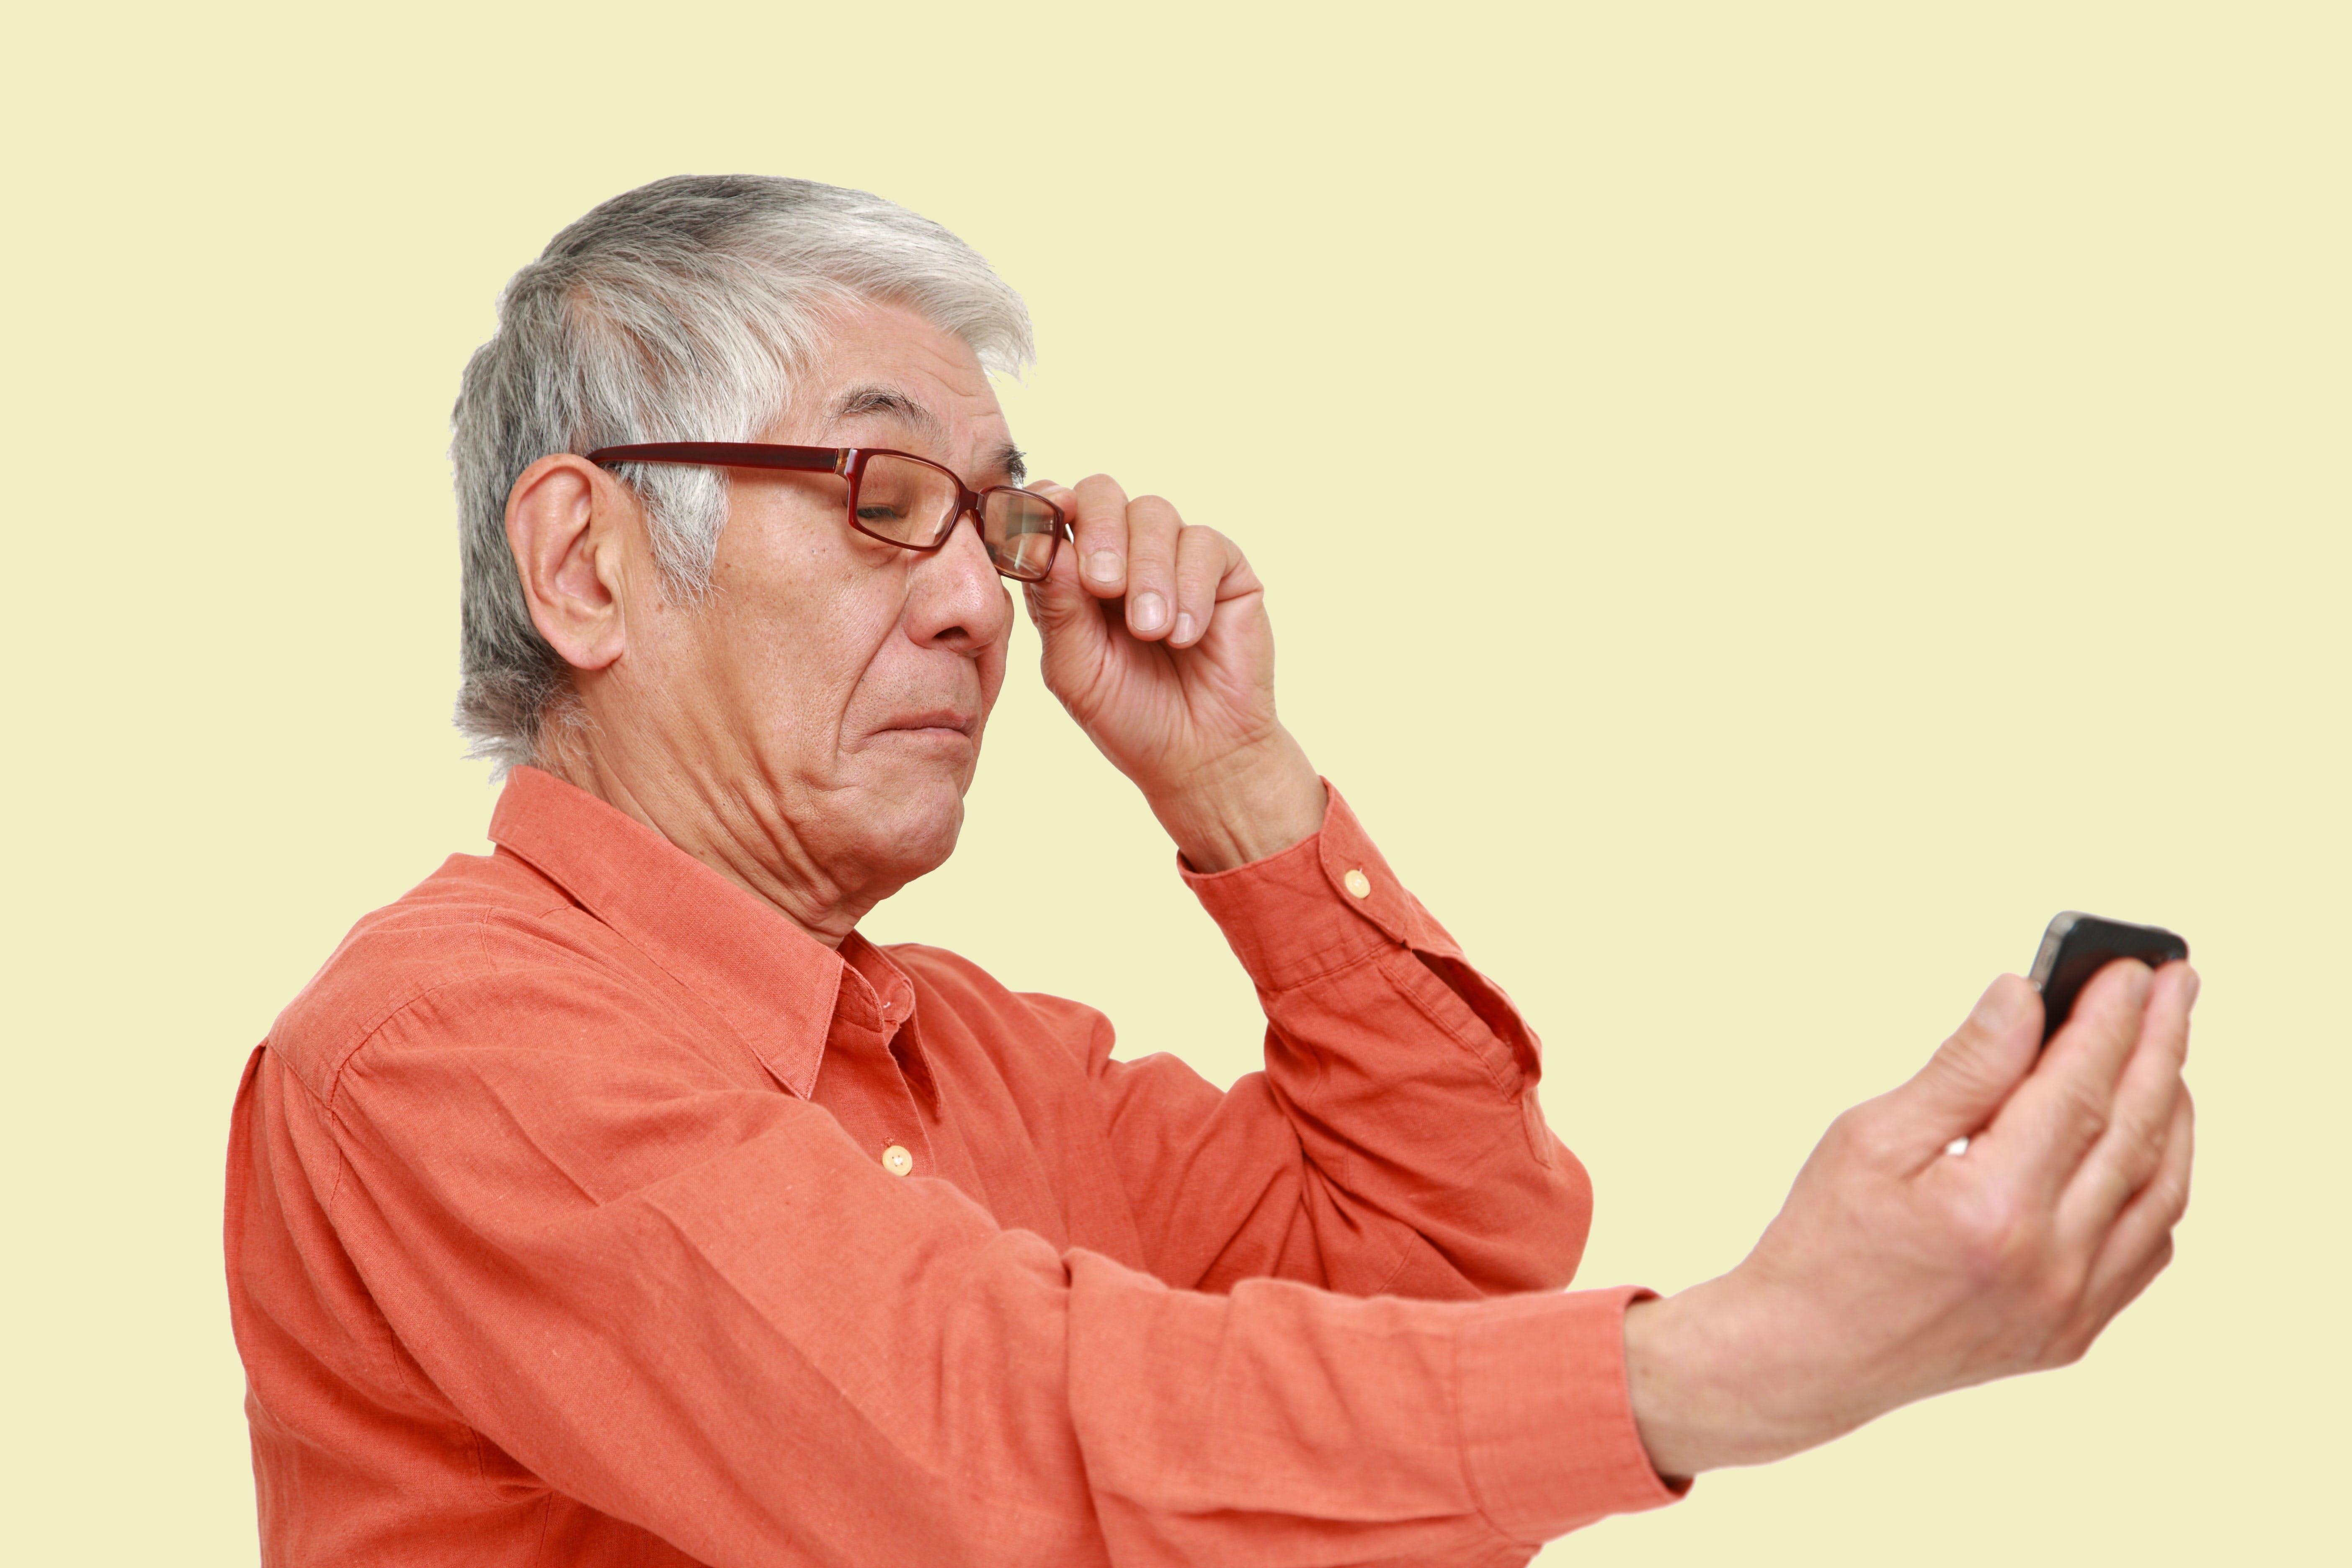 Hvorfor blir synet dårligere med alderen?